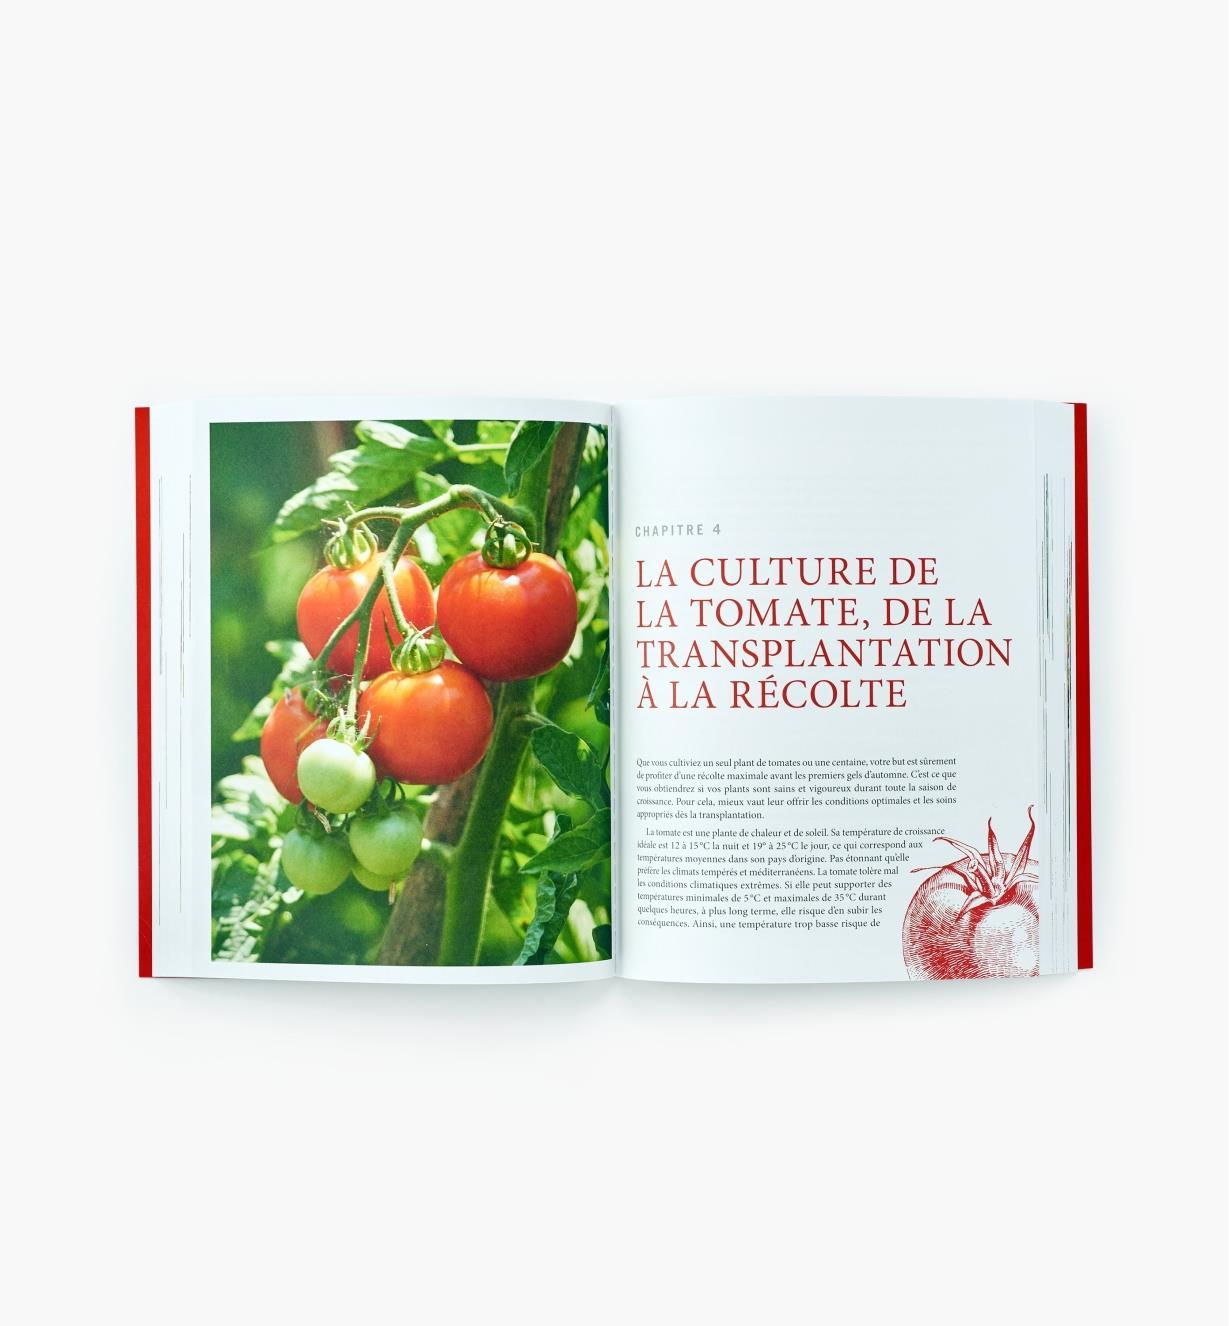 LD902 - La tomate De la terre a la table